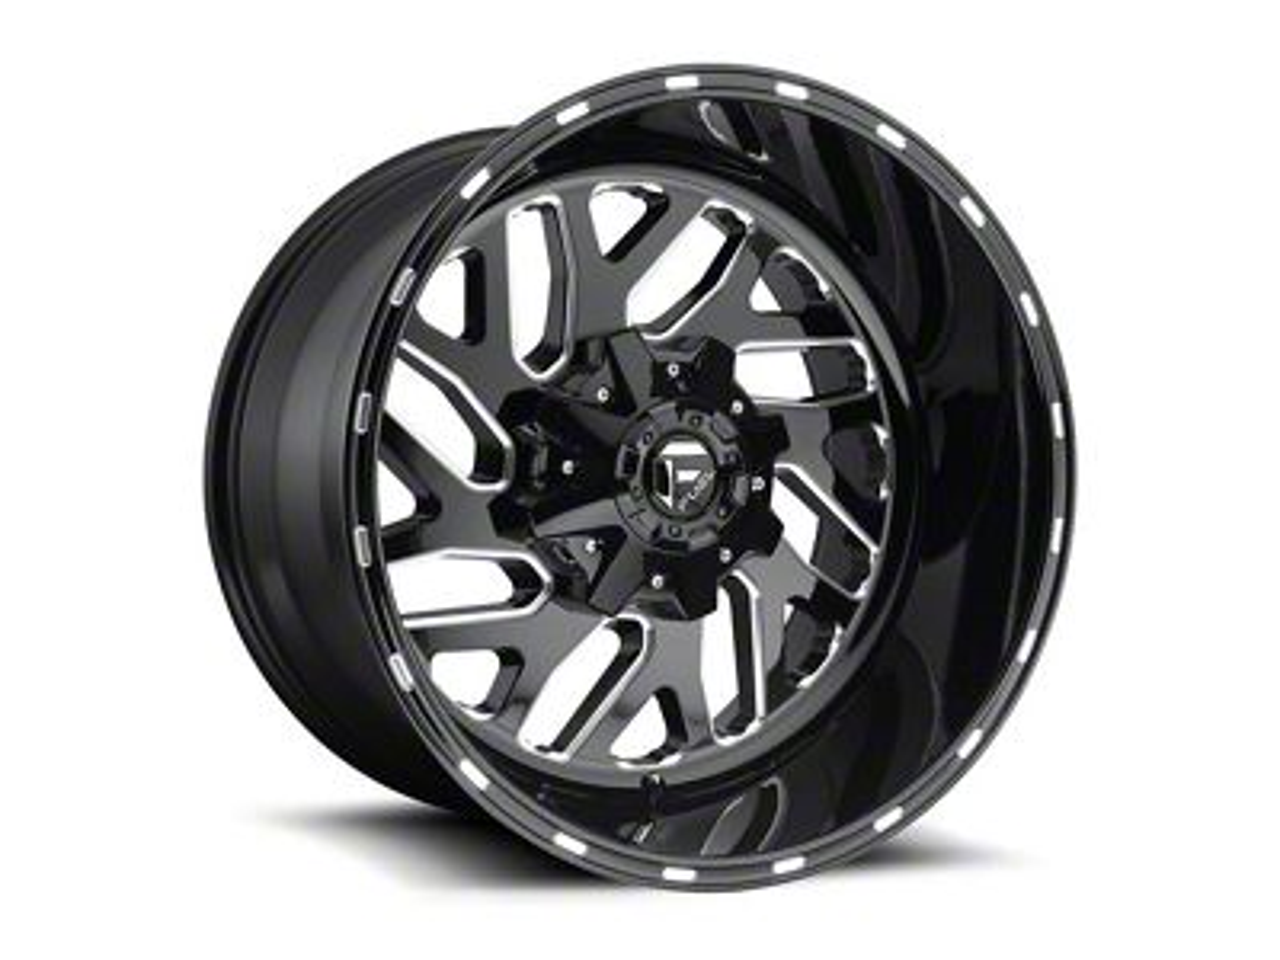 Fuel Wheels Triton Gloss Black Milled 5-Lug Wheel - 20x12 (02-18 RAM 1500, Excluding Mega Cab)